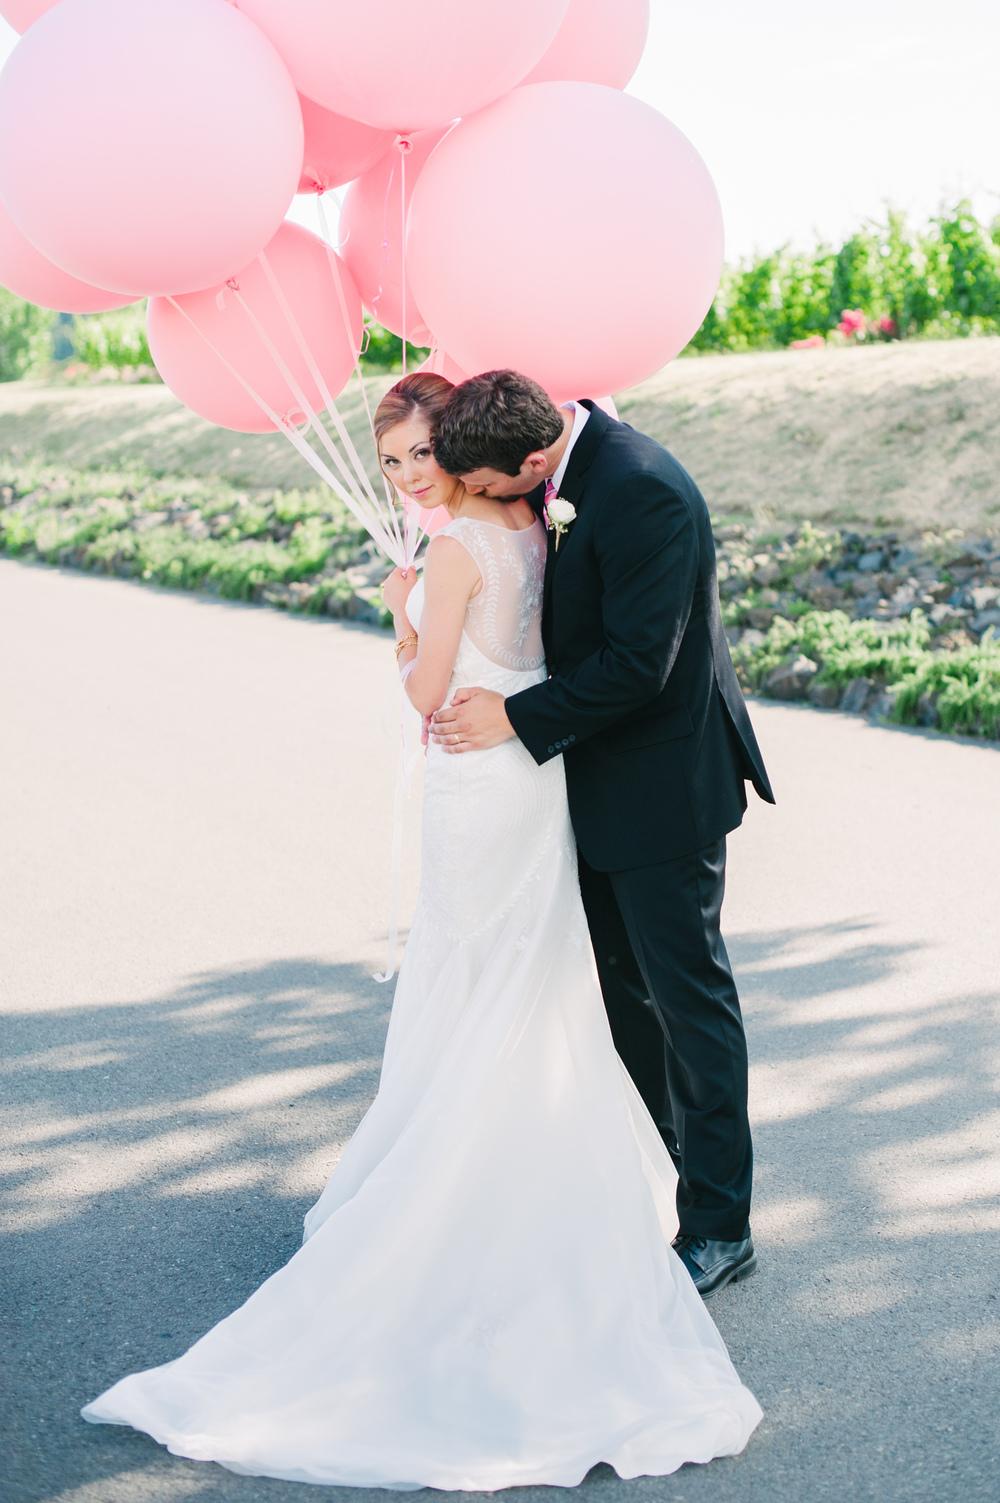 21-zenith-vineyard-wedding-portland-oregon-christa-taylor-photography.jpg